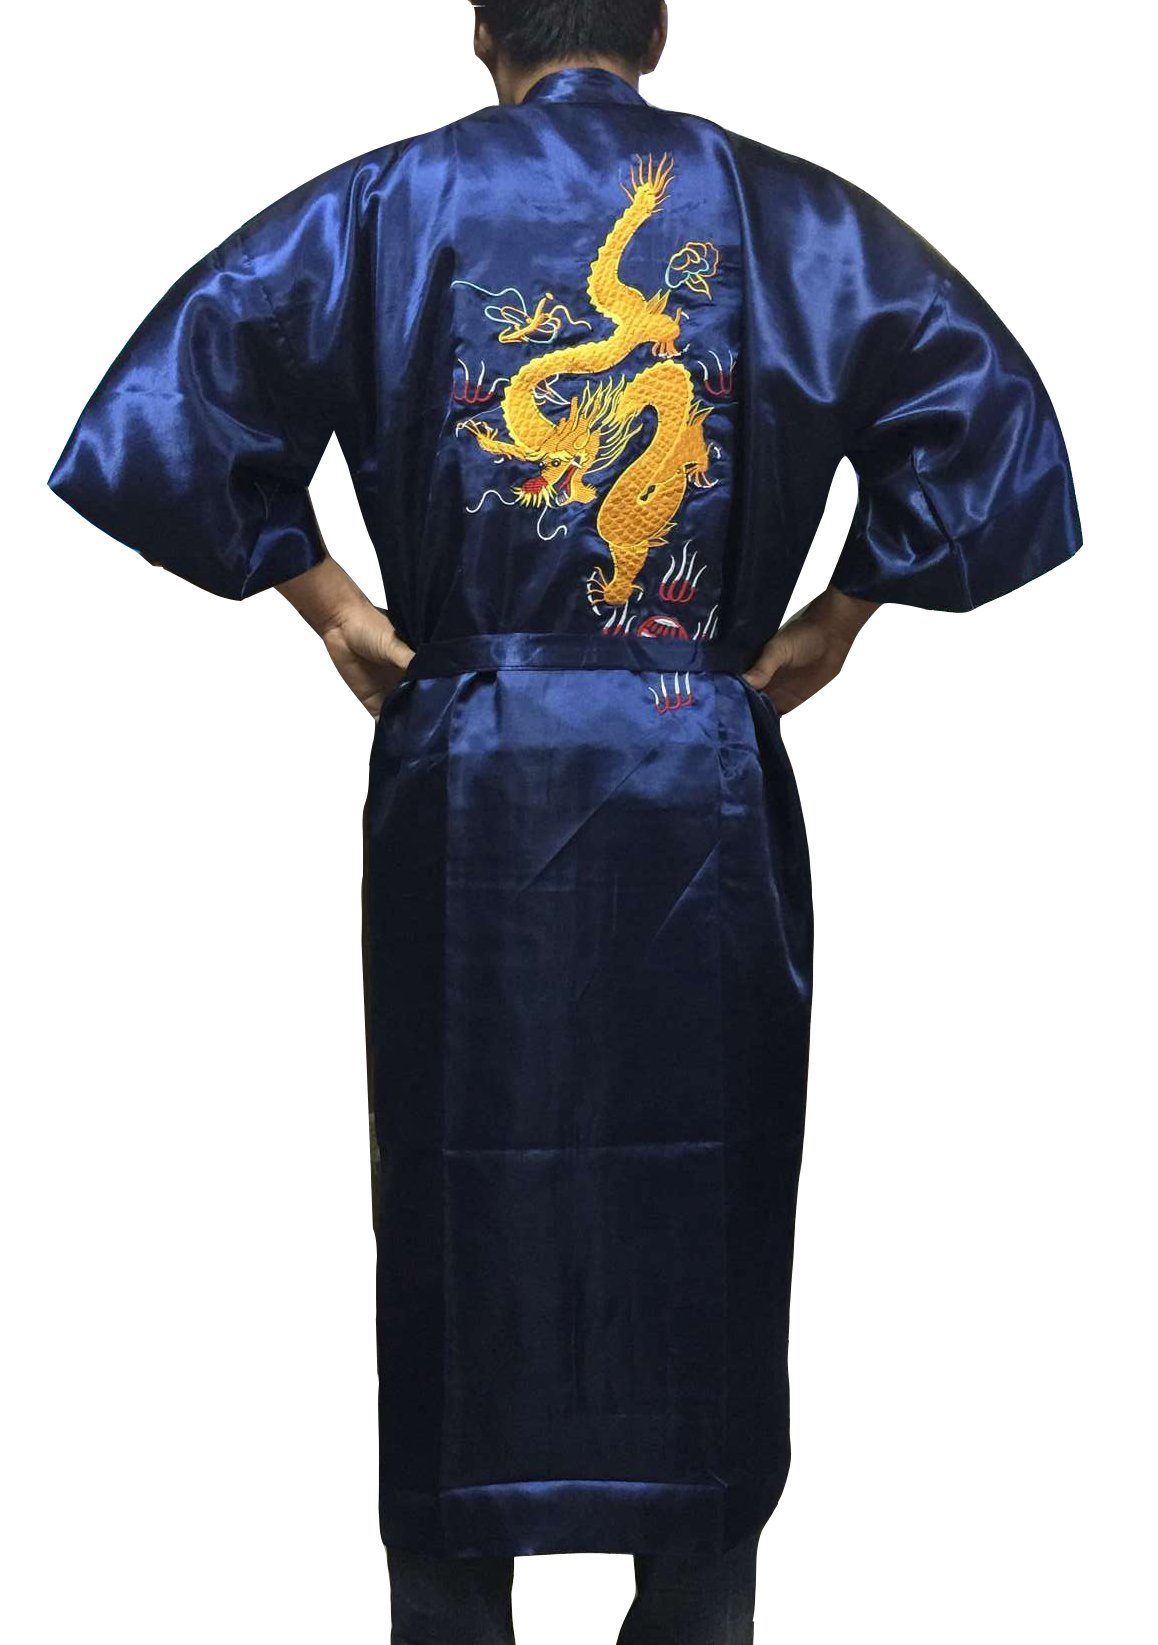 YueLian Men's Satin Robe Sleepwear Nightgown Bath Robe Dark Blue